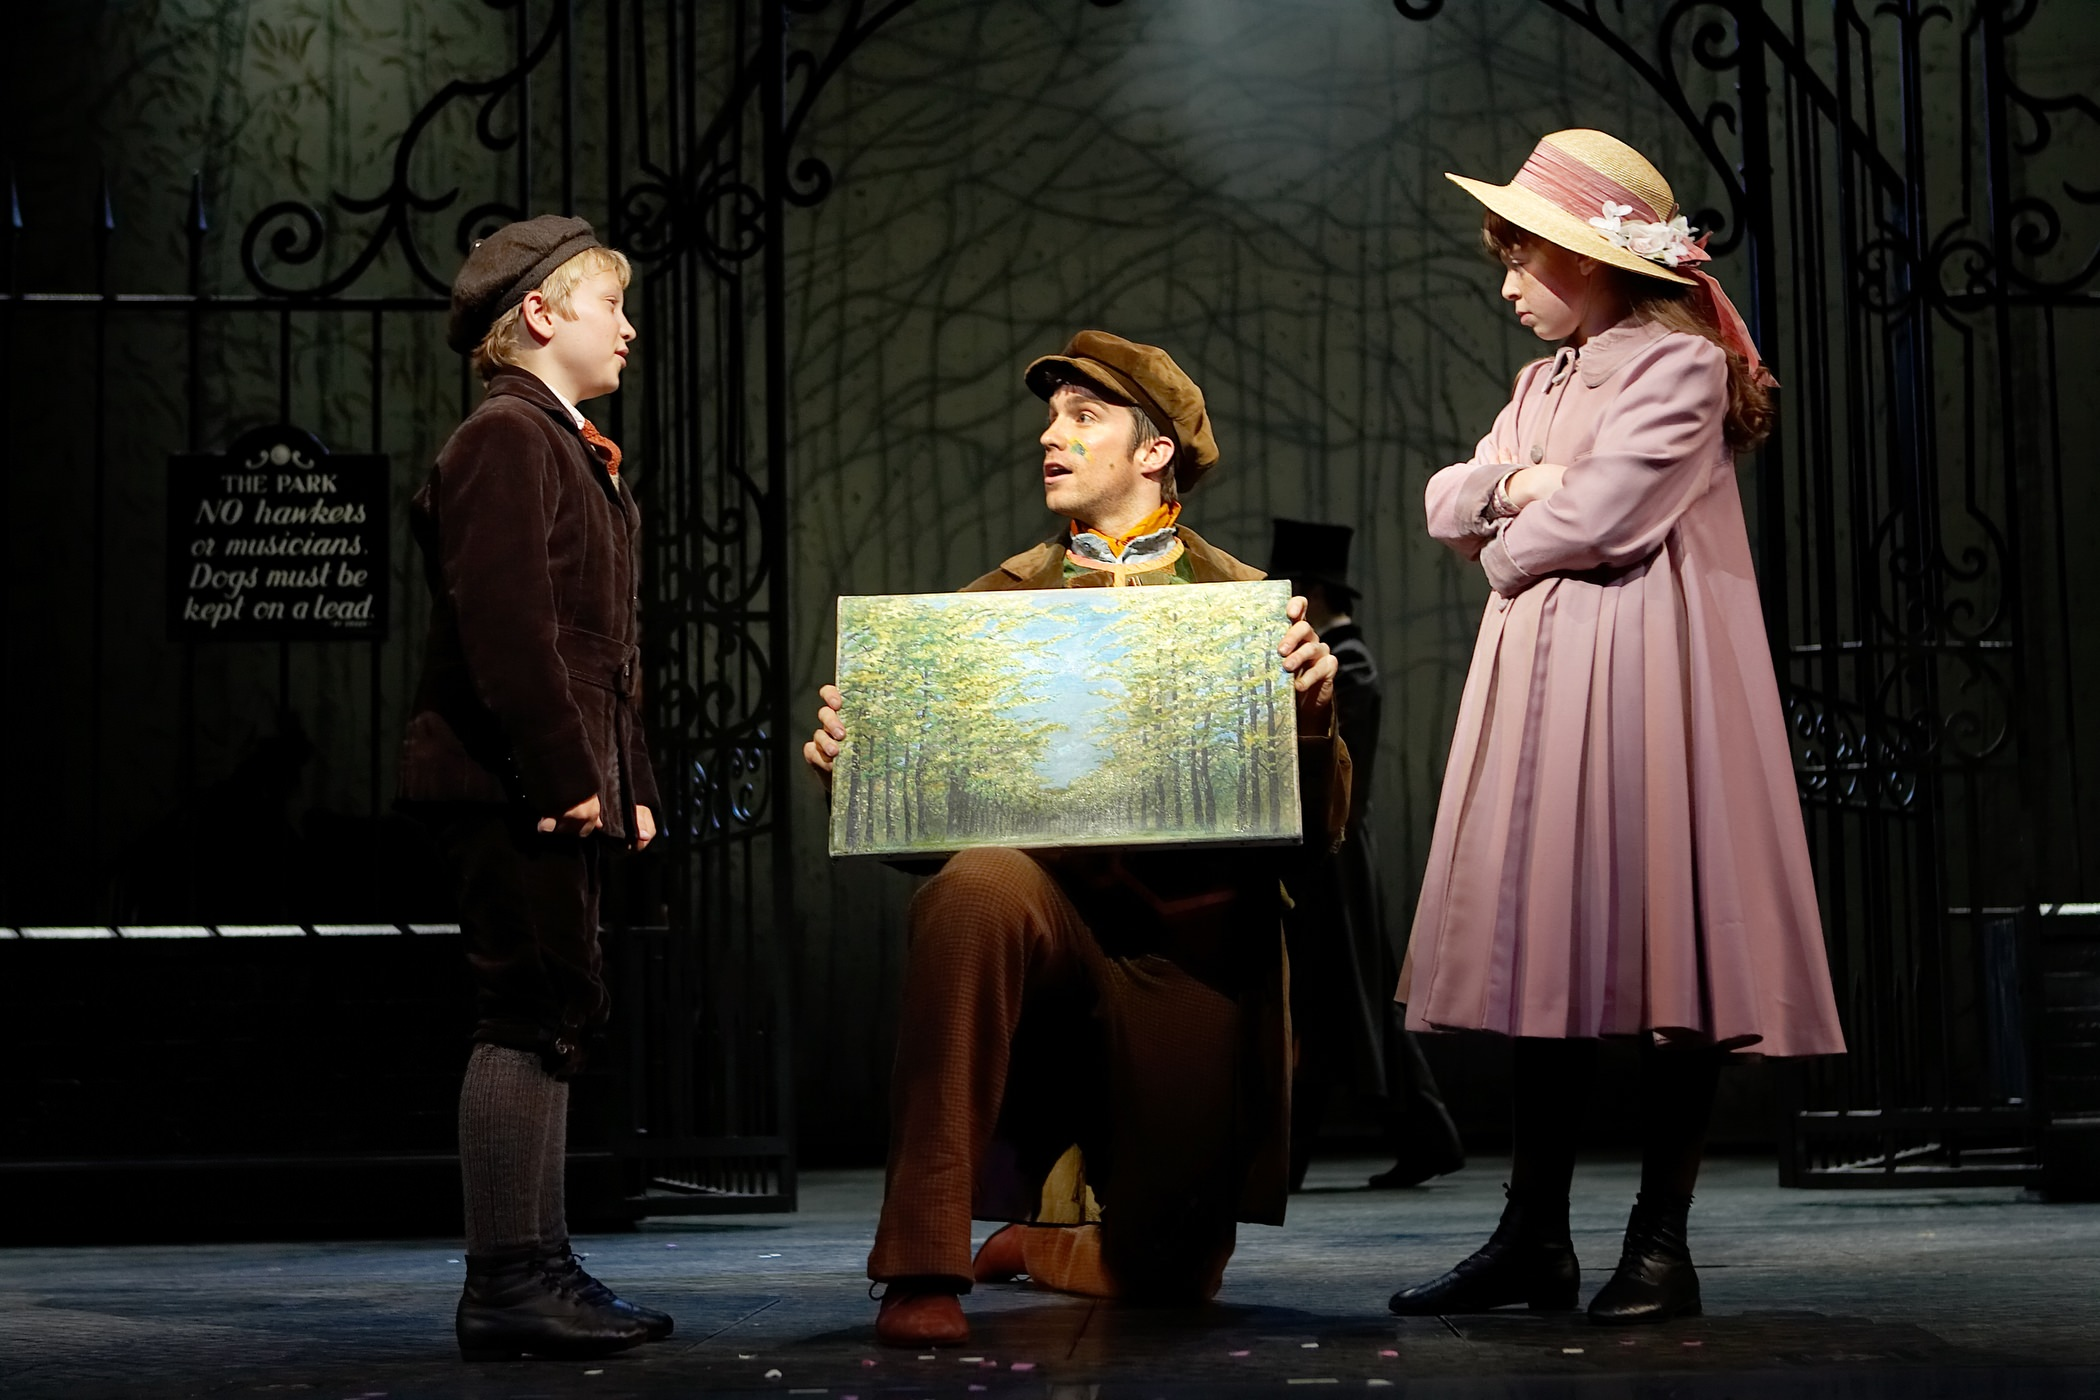 07.Mary.Poppins.693-0060.JPG